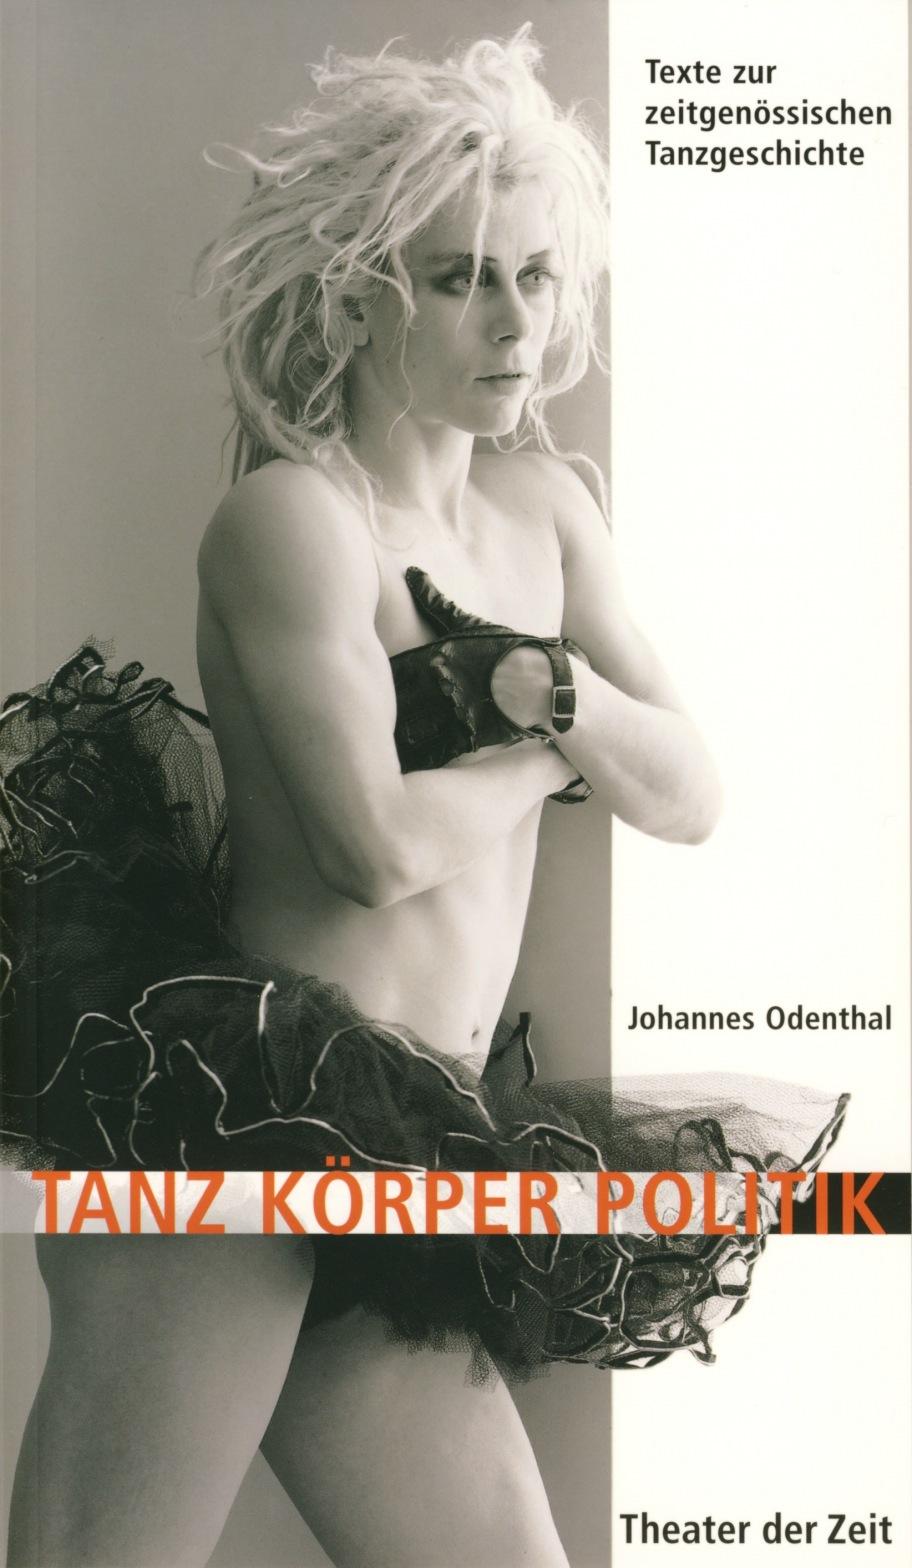 Johannes Odenthal: Tanz Körper Politik